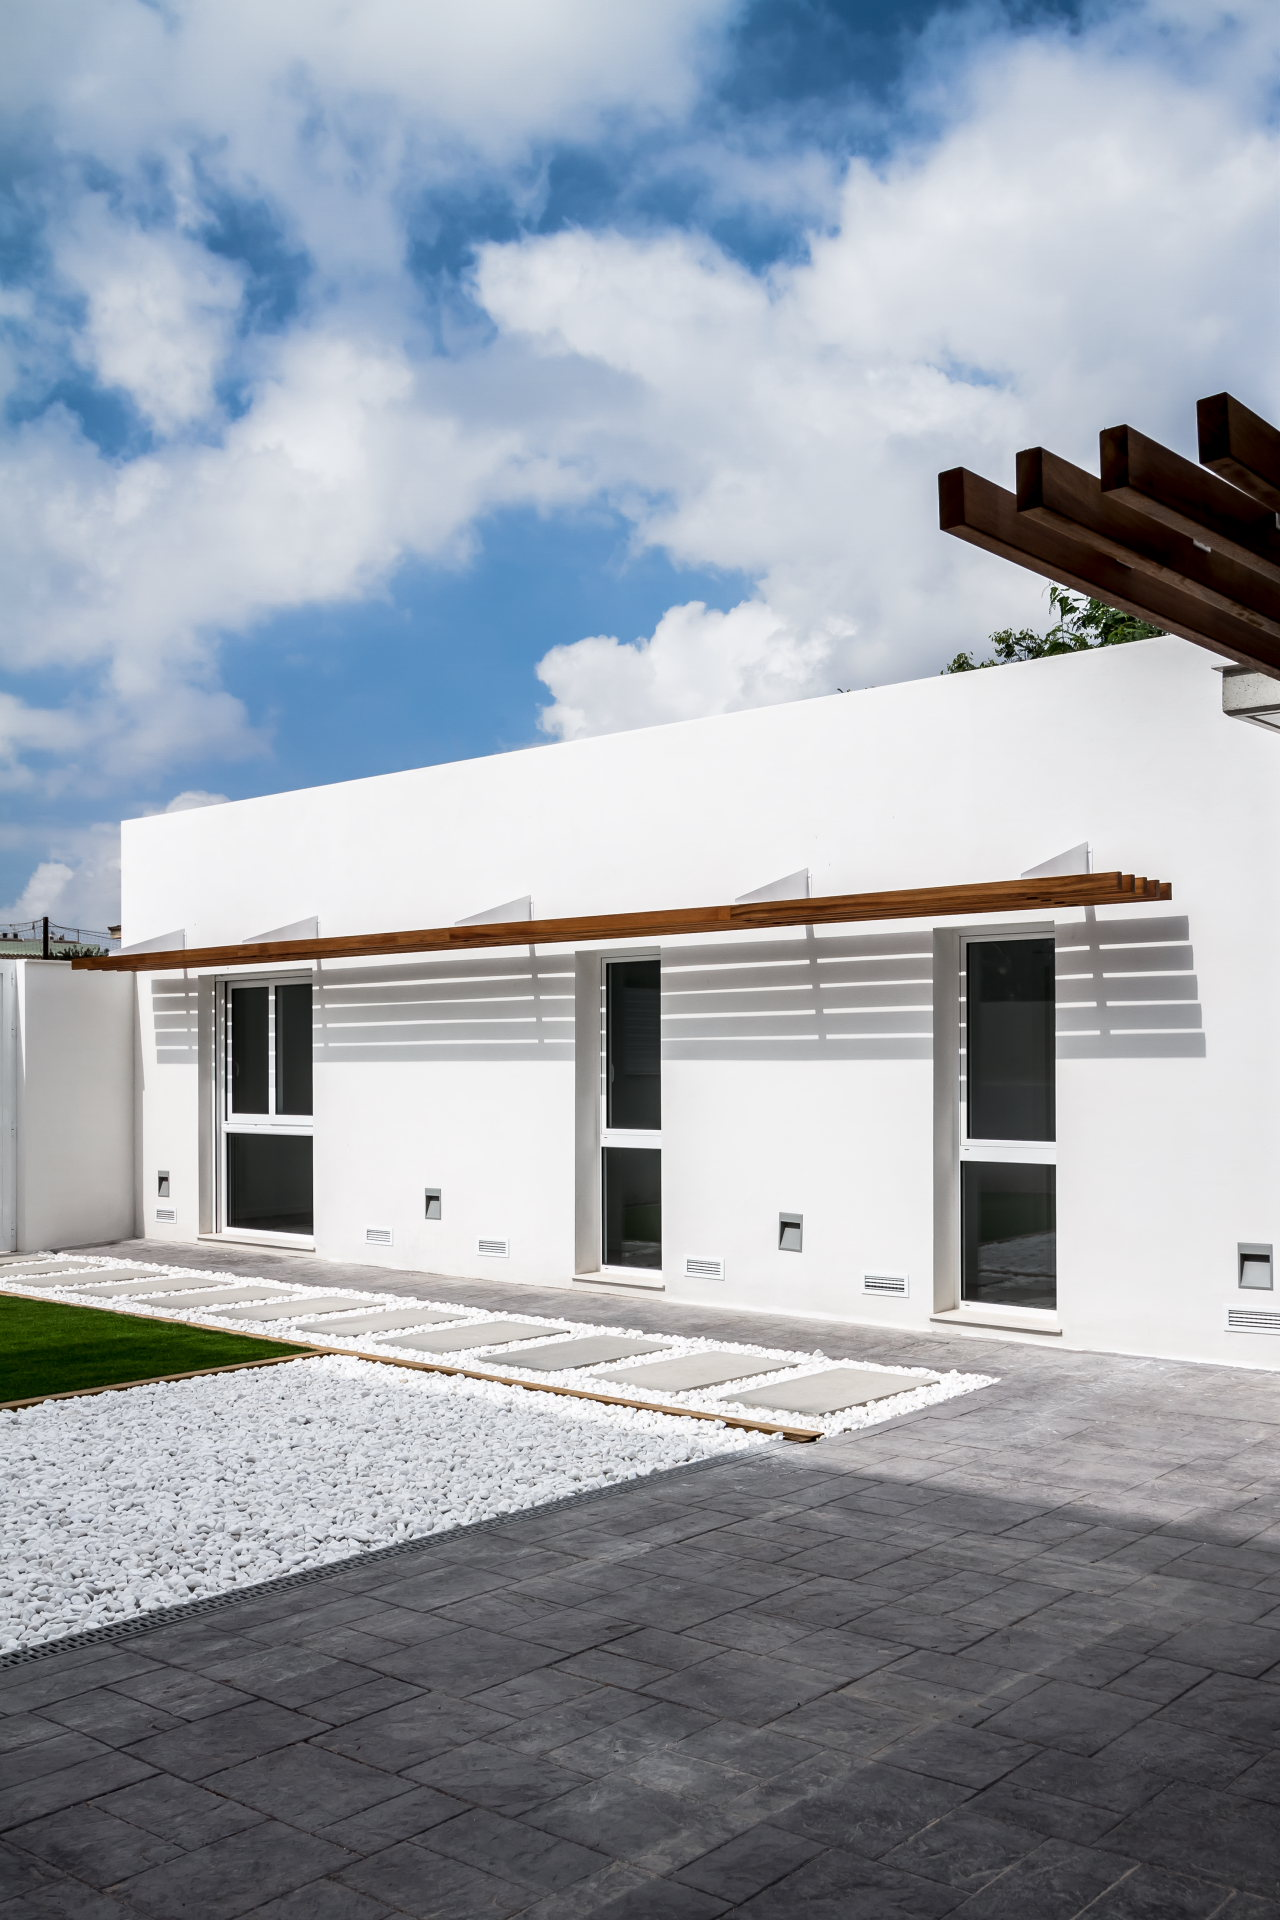 fotografia-arquitectura-valencia-german-cabo-viraje-museros (24)